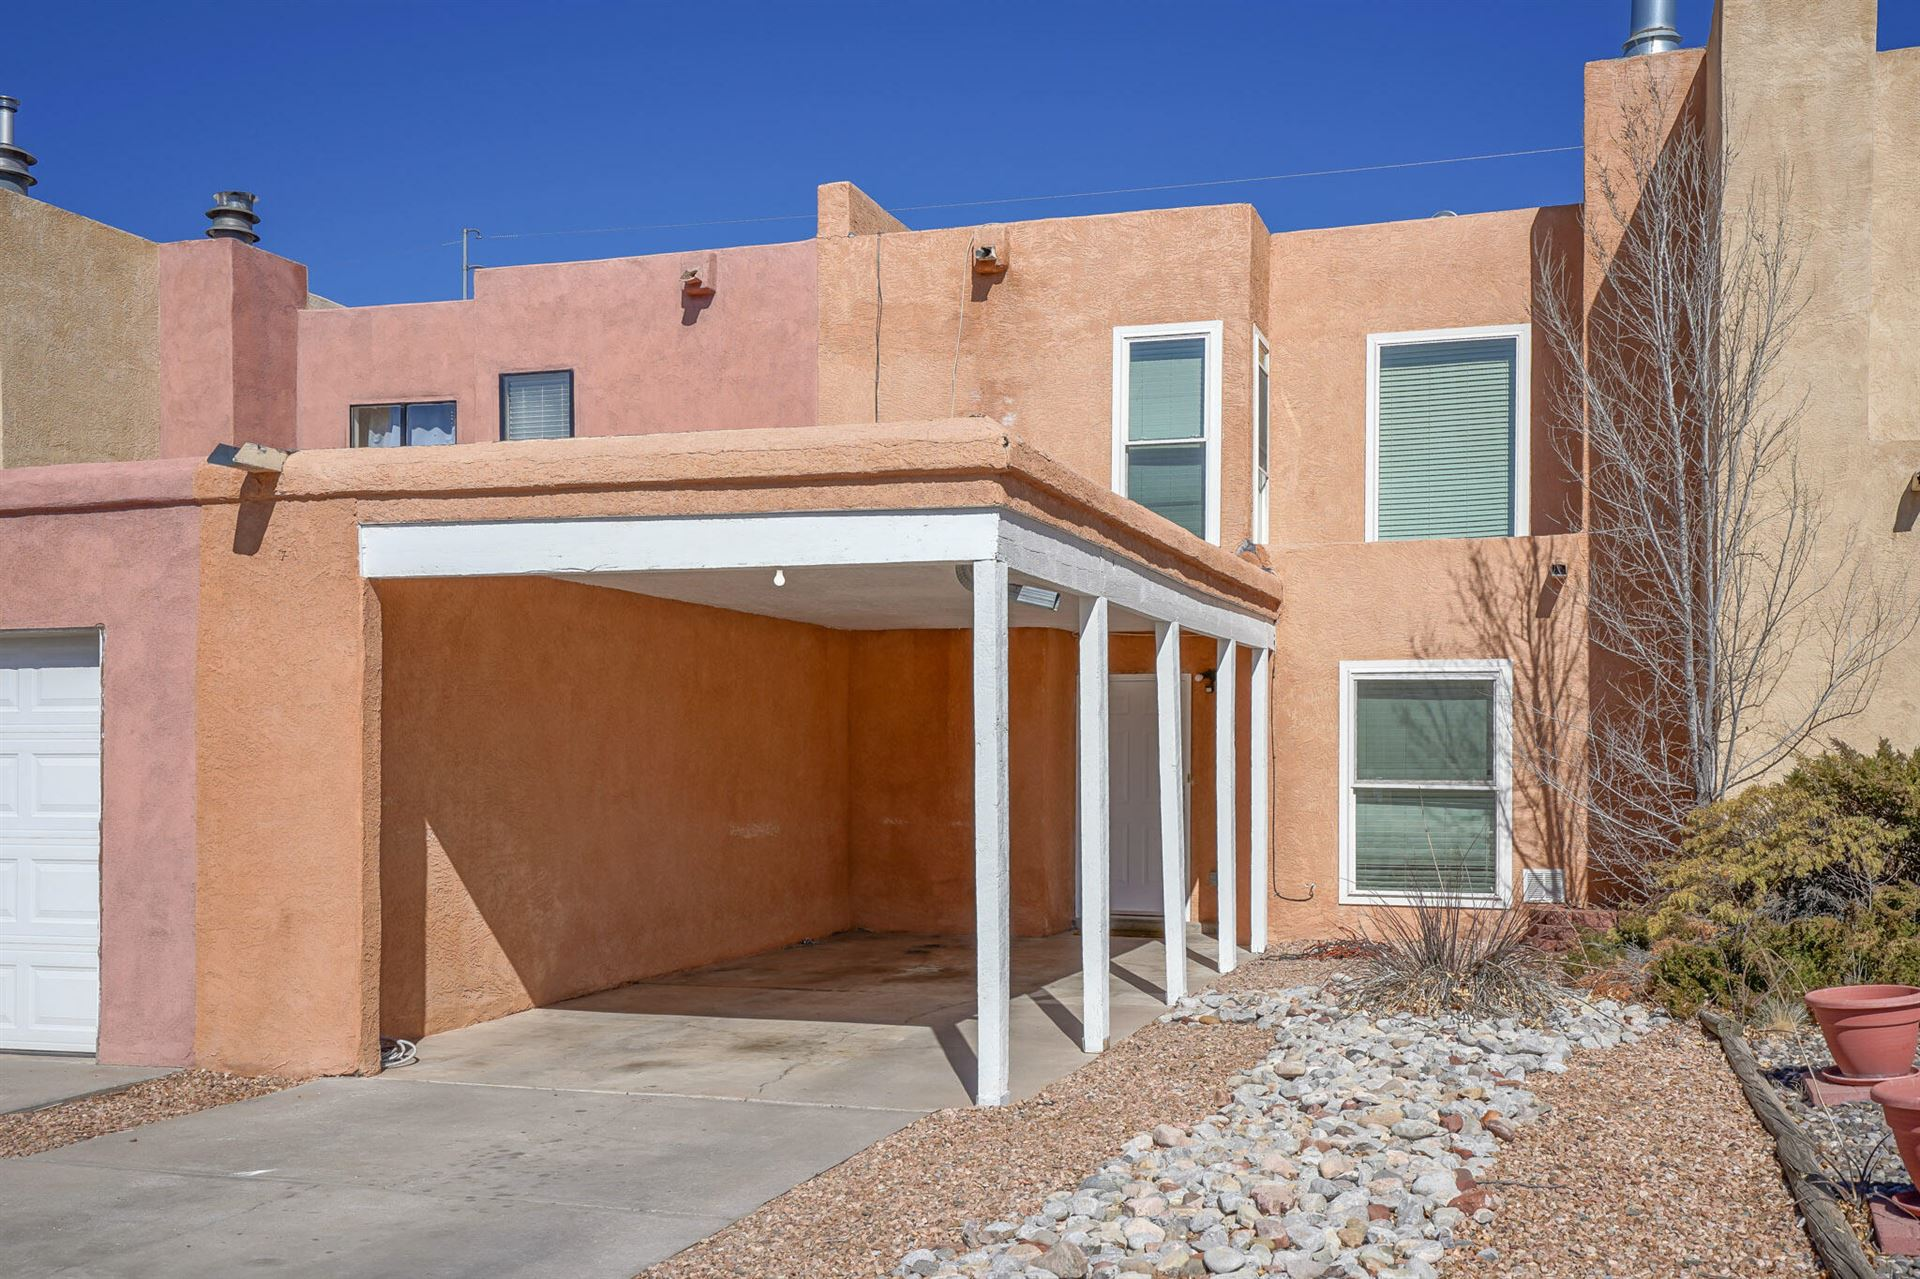 Photo of 9013 HENDRIX Road NE, Albuquerque, NM 87111 (MLS # 986484)